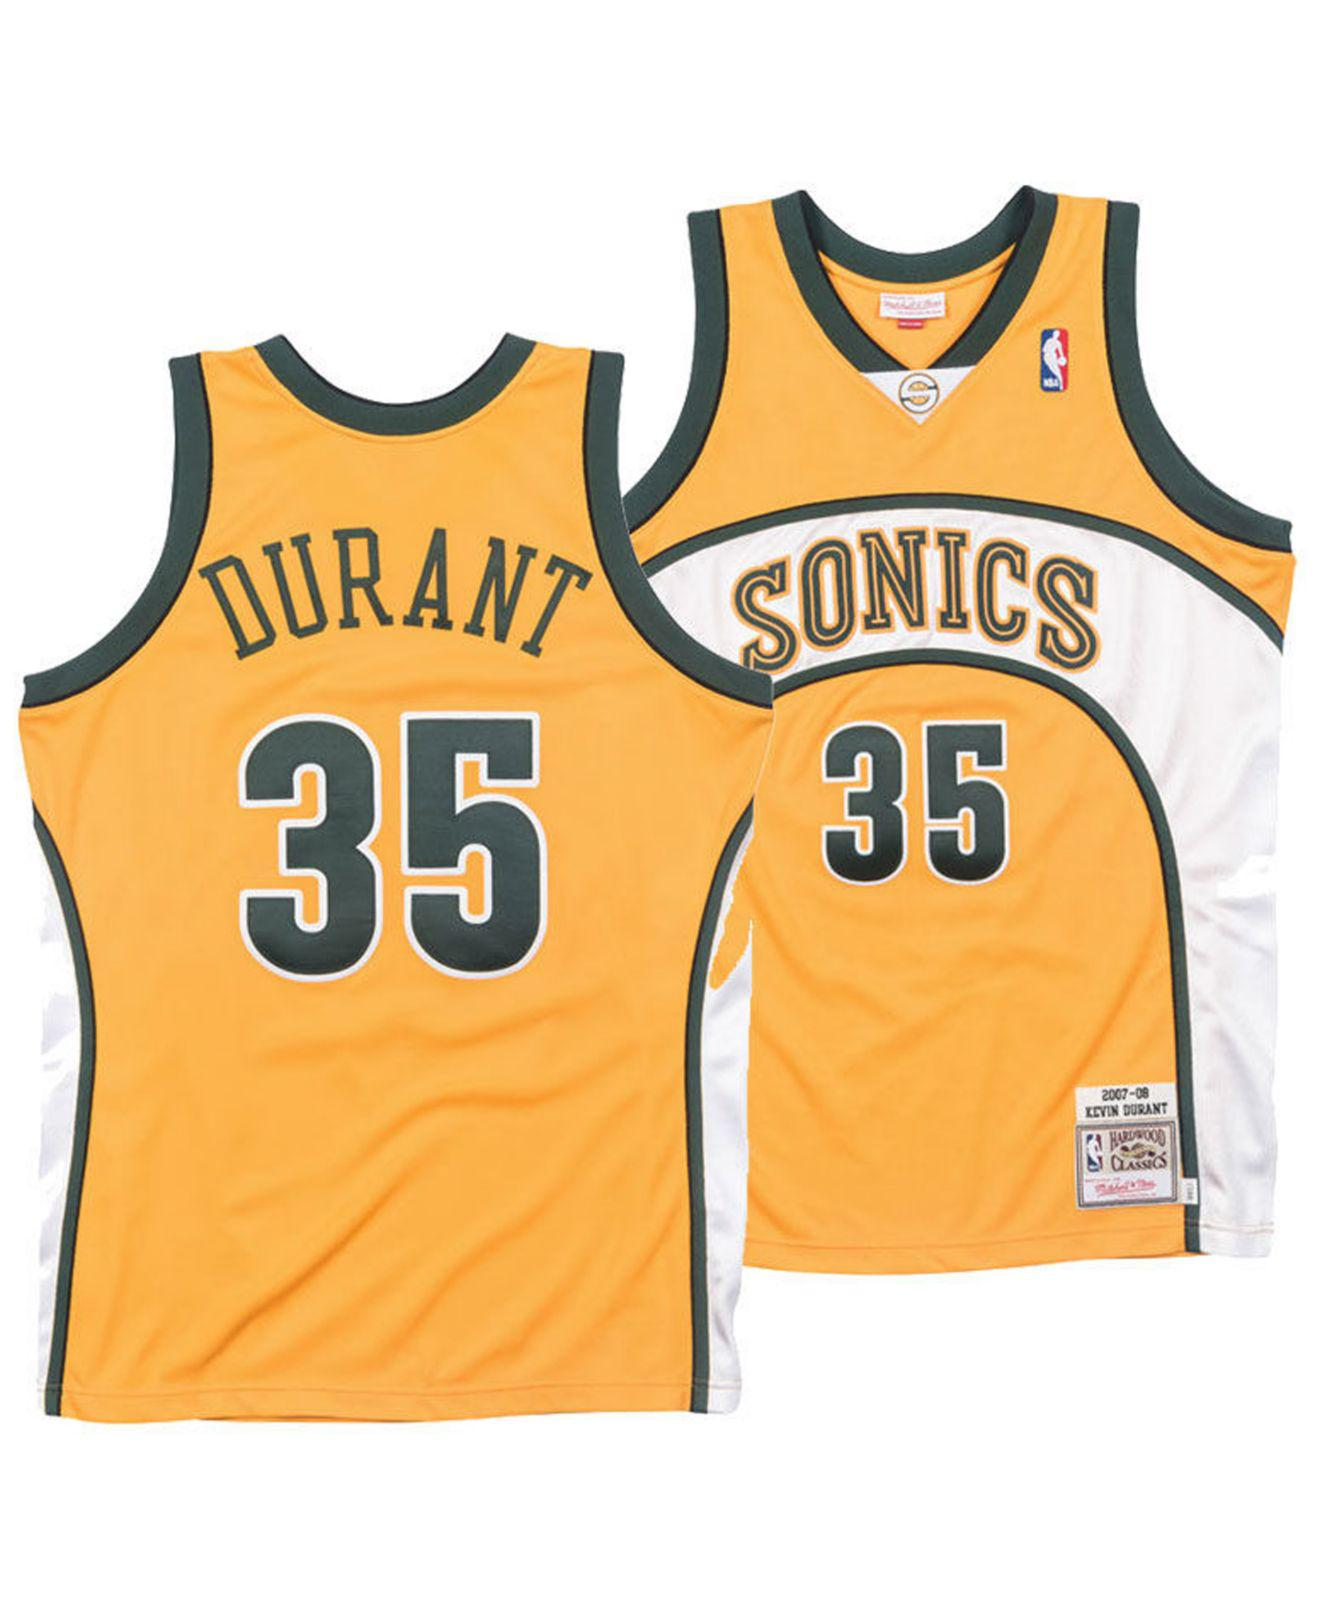 3f04115e8e8f Mitchell   Ness. Men s Metallic Kevin Durant Seattle Supersonics Authentic  Jersey